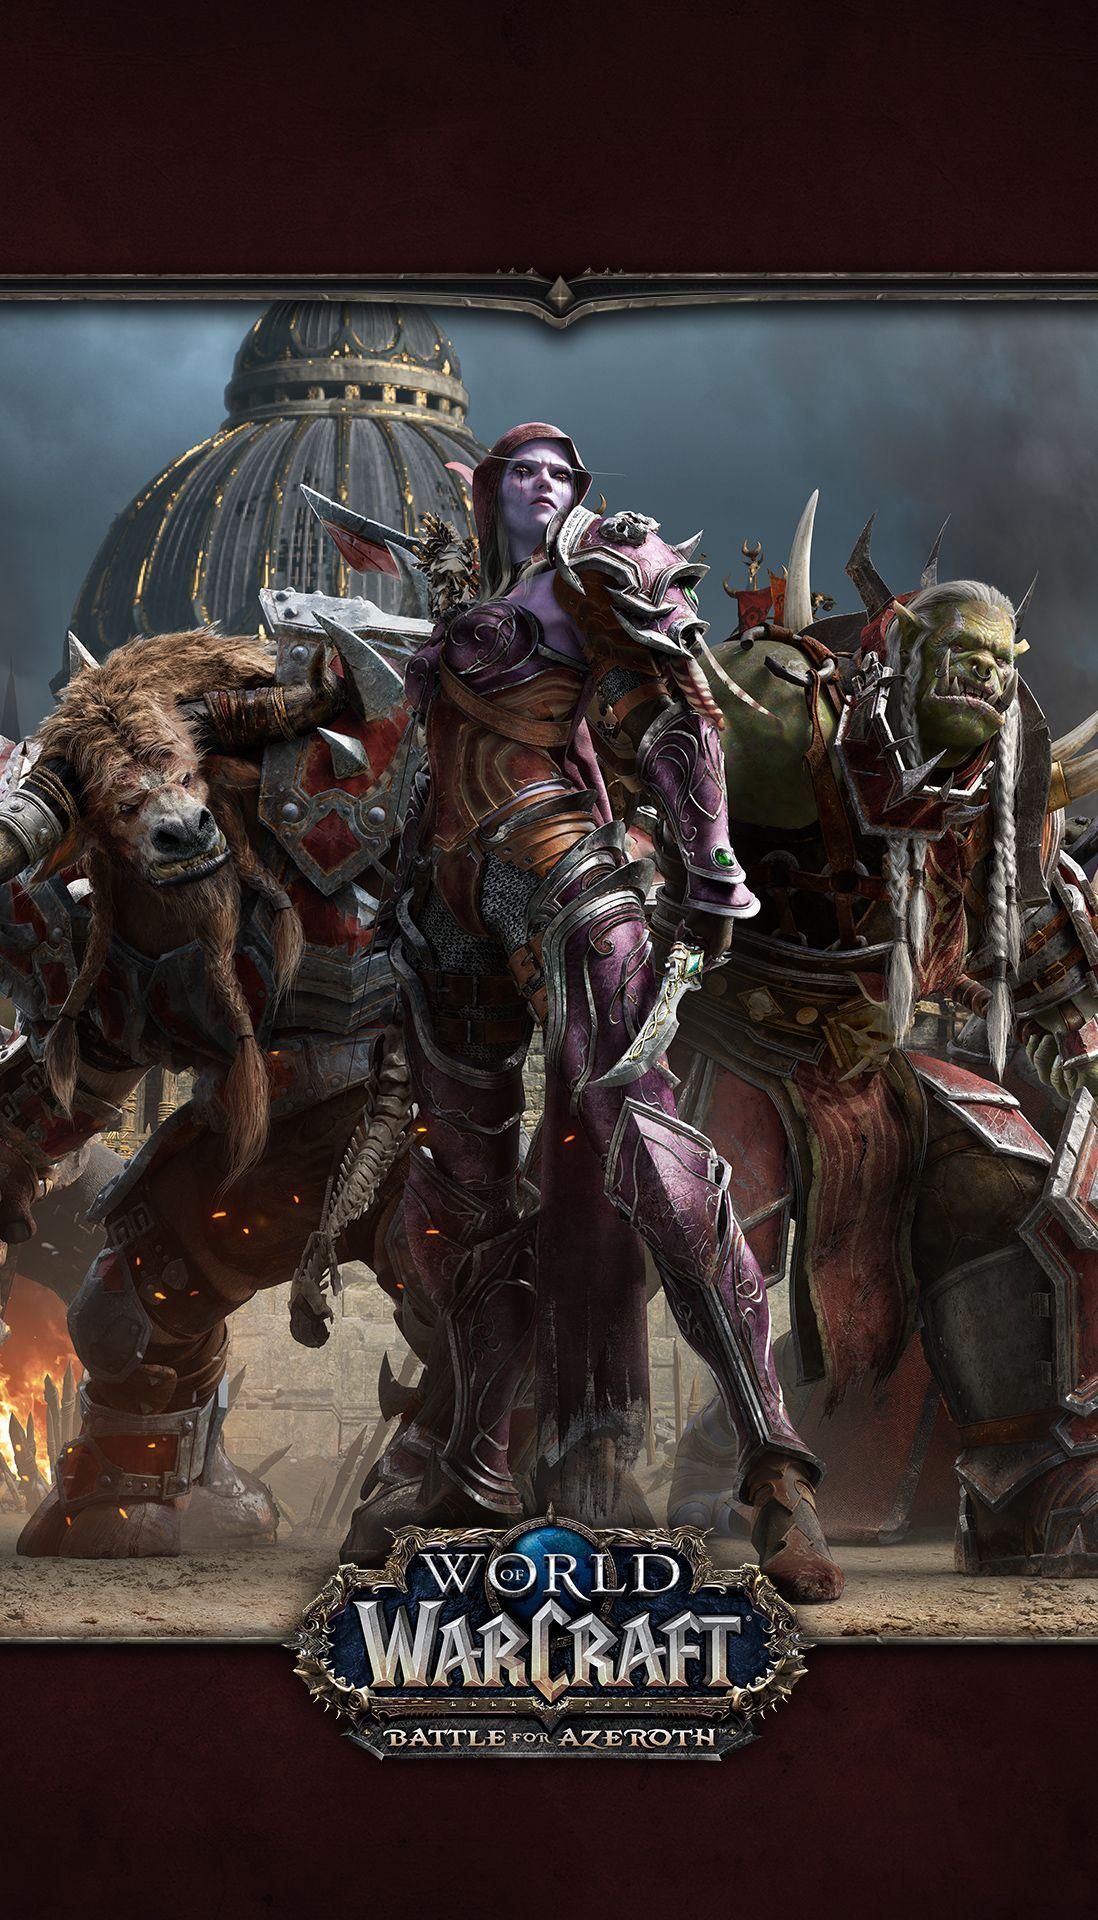 Nbjyxpdn0loq1517347586182 Jpg 1098 1920 World Of Warcraft